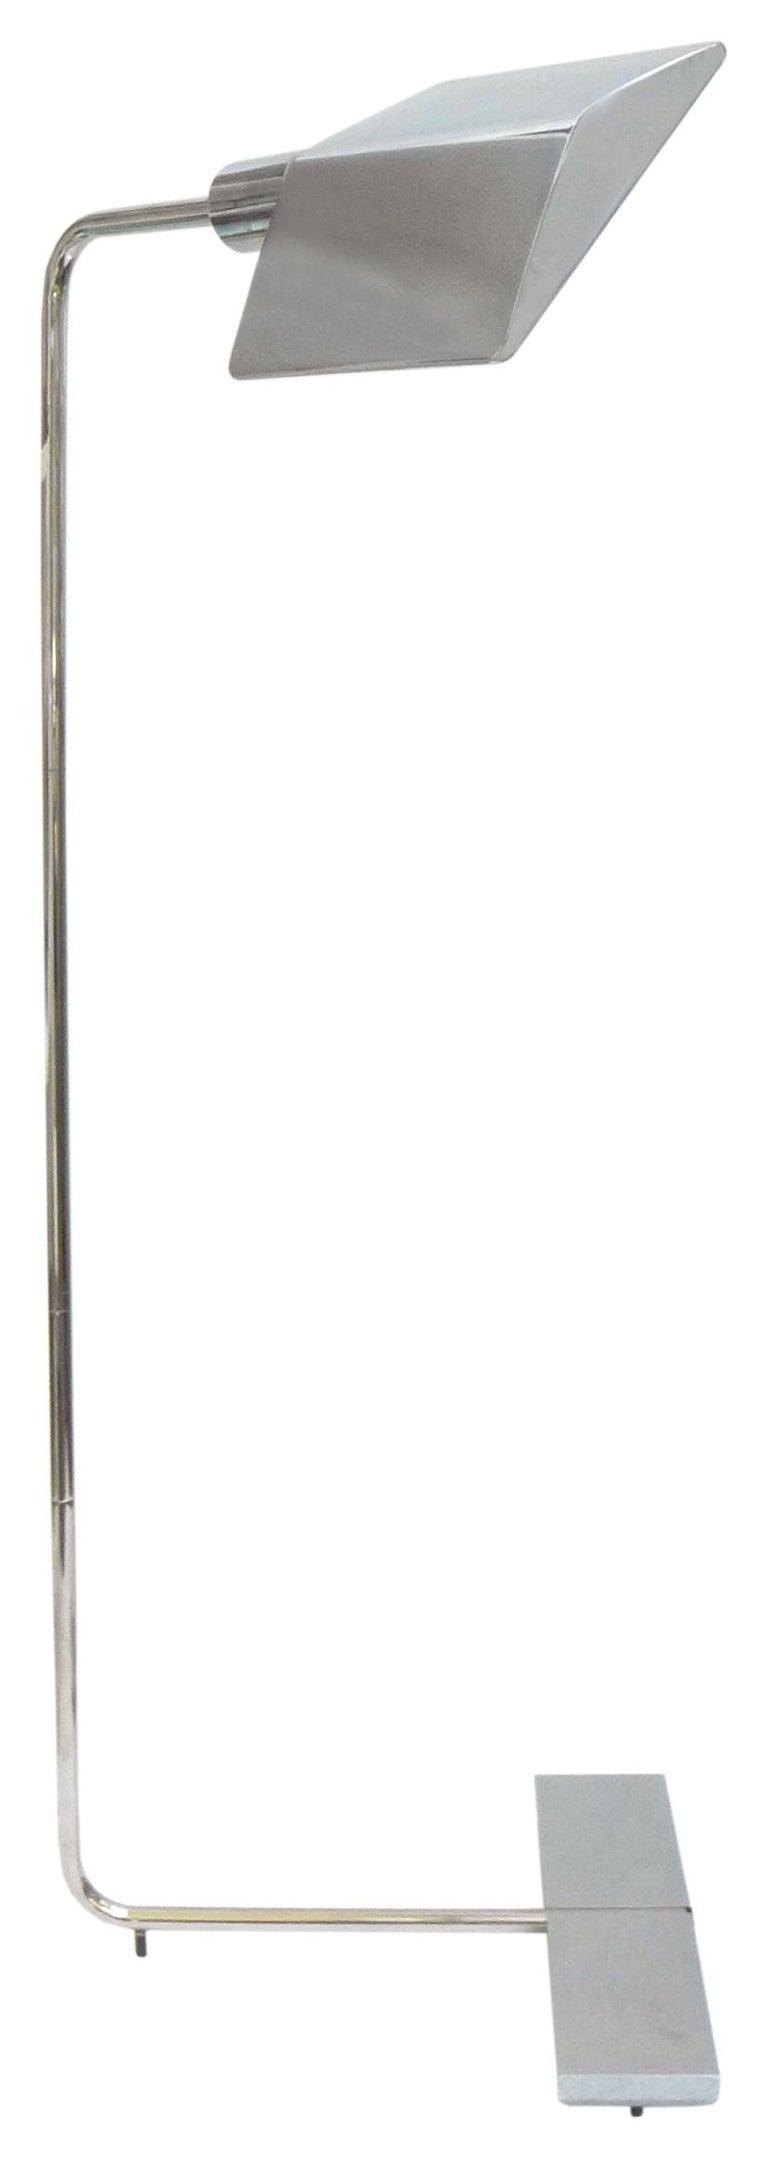 American Chrome Floor Lamp by Cedric Hartman For Sale